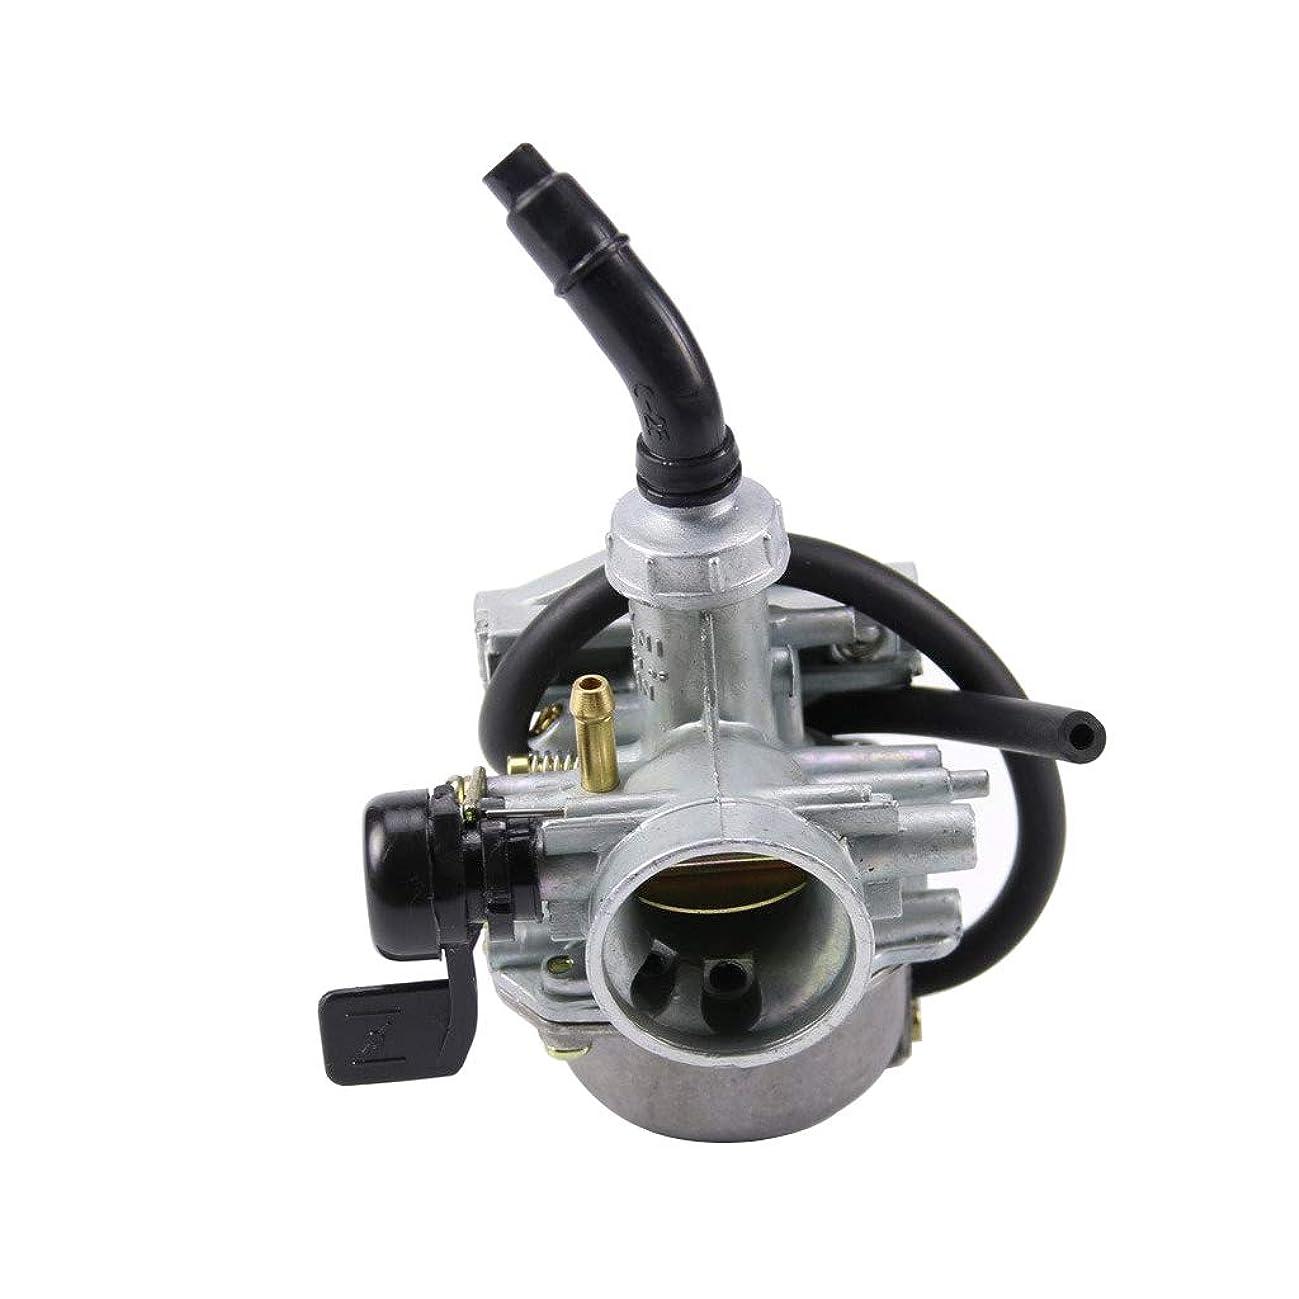 ZXTDR PZ19 19mm Choke Lever Carburetor Carb for 50cc 70cc 110cc ATV Go-Kart Pit Dirt Bikes